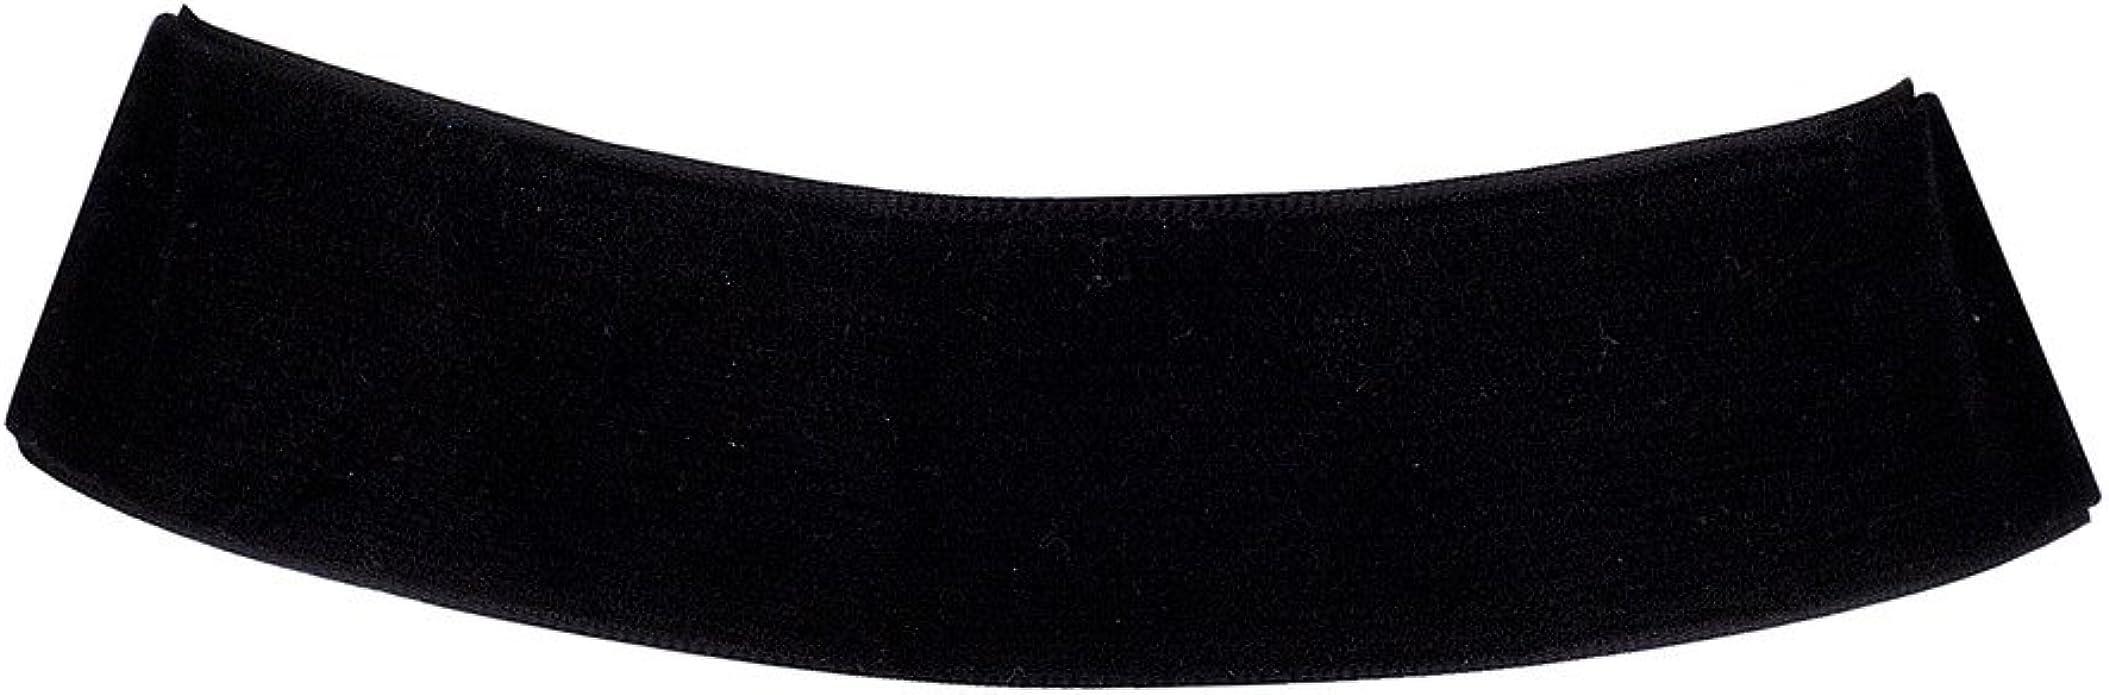 Lux Accessories Classic 90s Large Black Velvet Tie Collar Choker Necklace